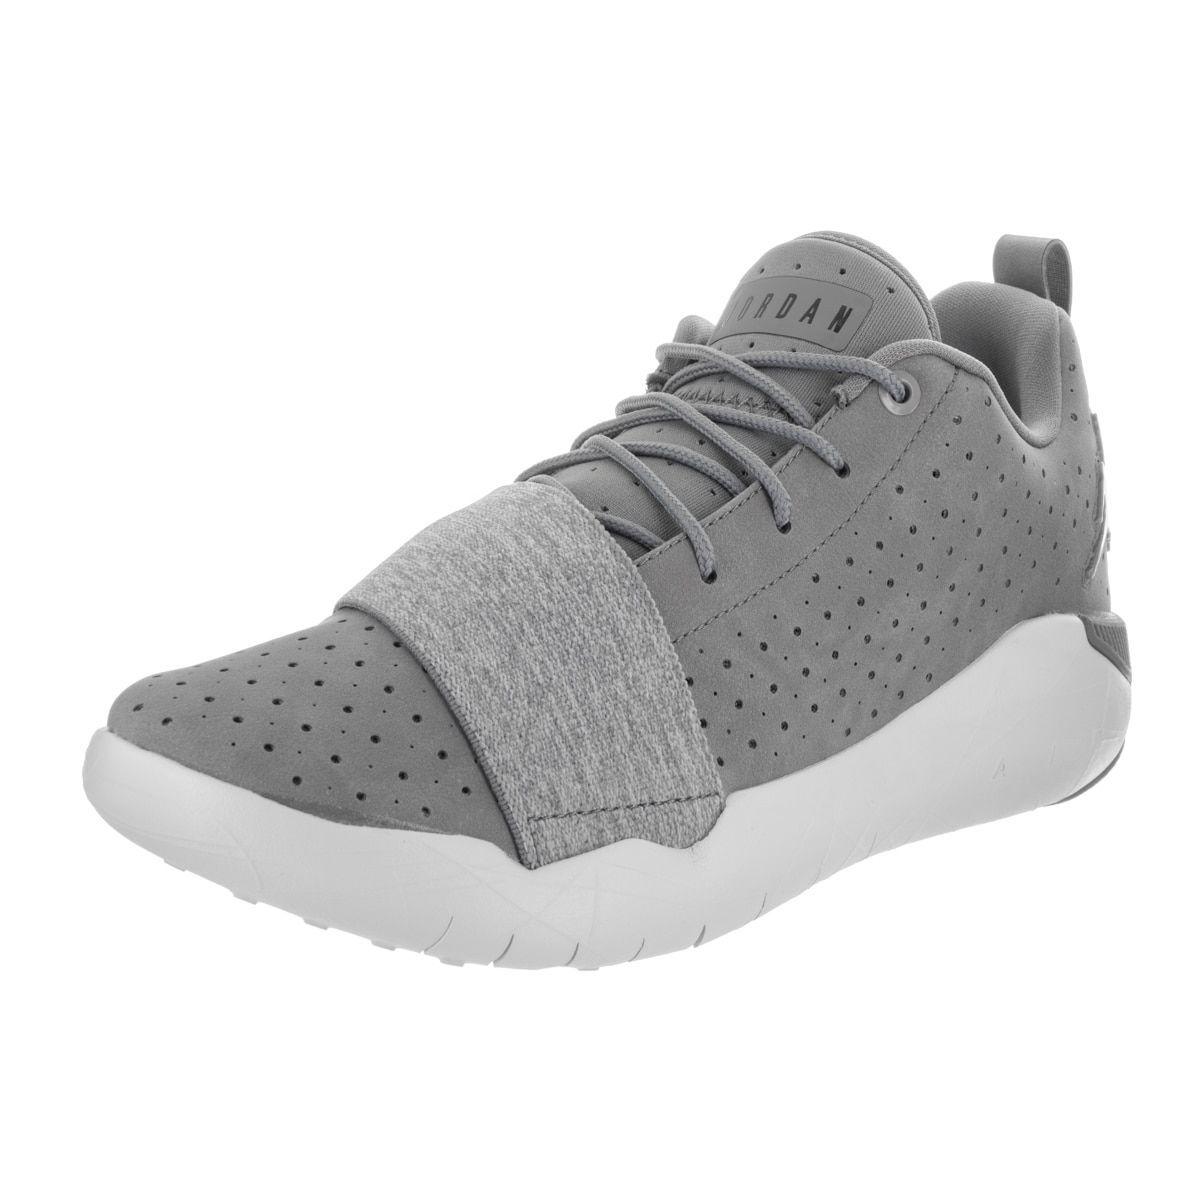 2dc44b0dde3ab0 Nike Jordan Men s Jordan 23 Breakout Basketball Shoe